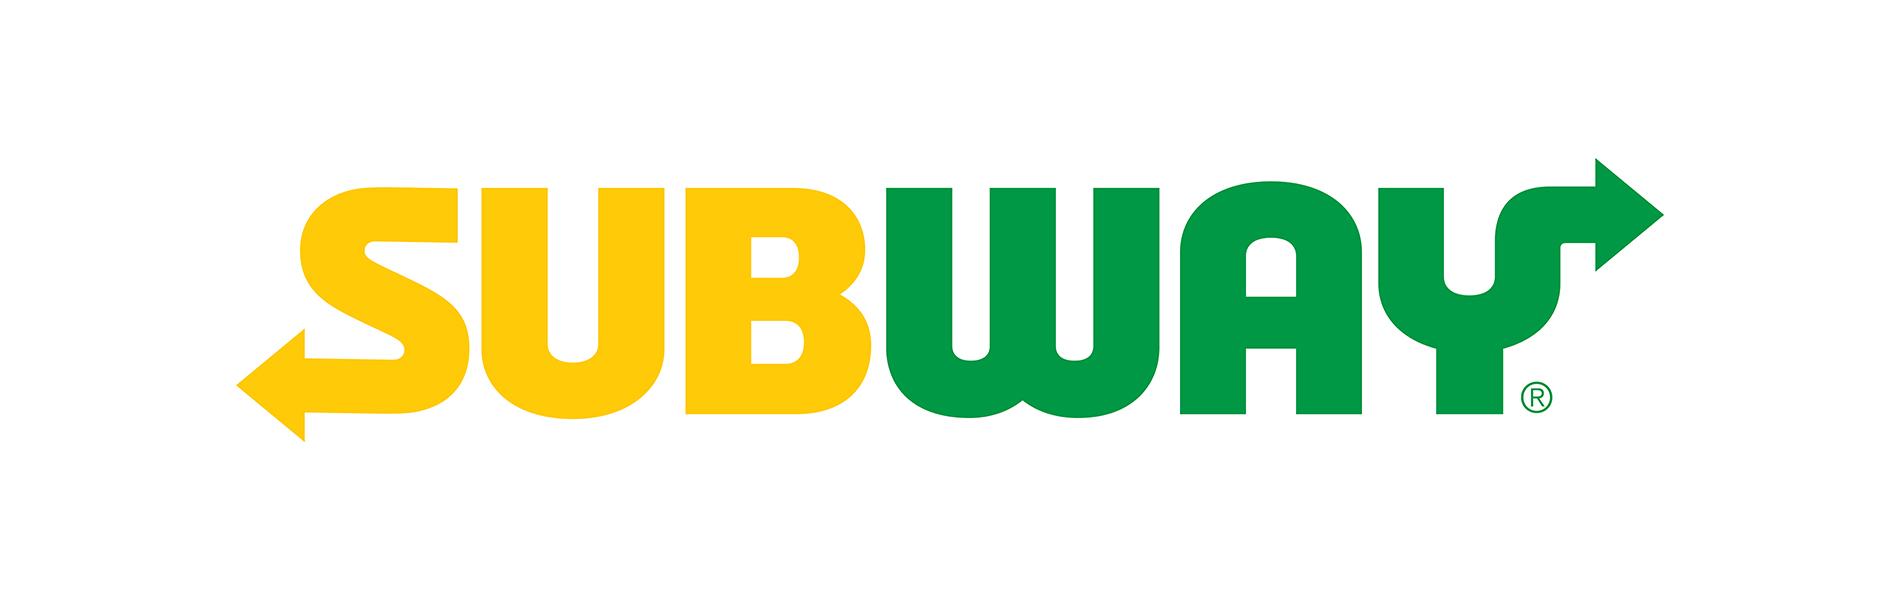 subway restaurants reveals bold new logo and symbol